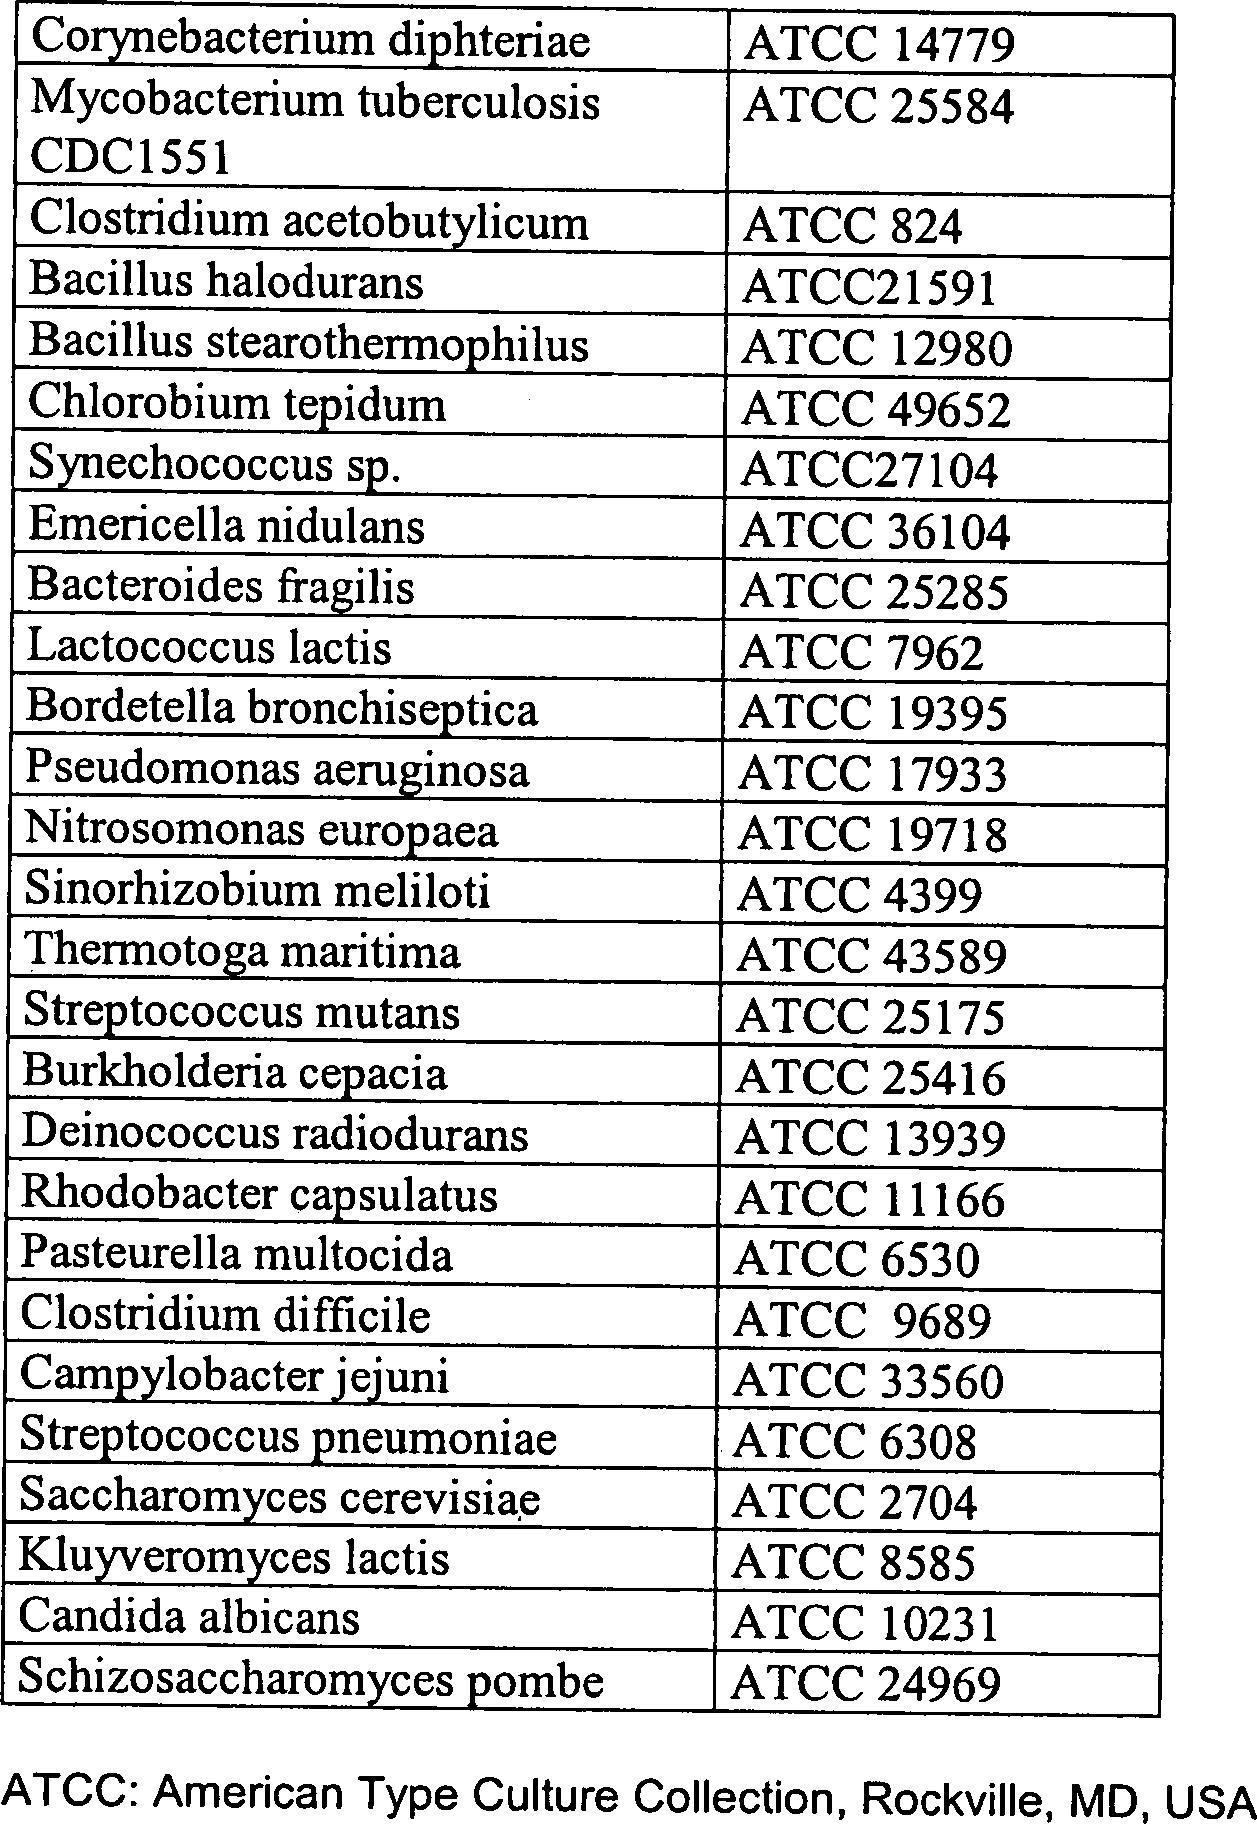 DE10239082A1 - Fermentative production of sulfur-containing